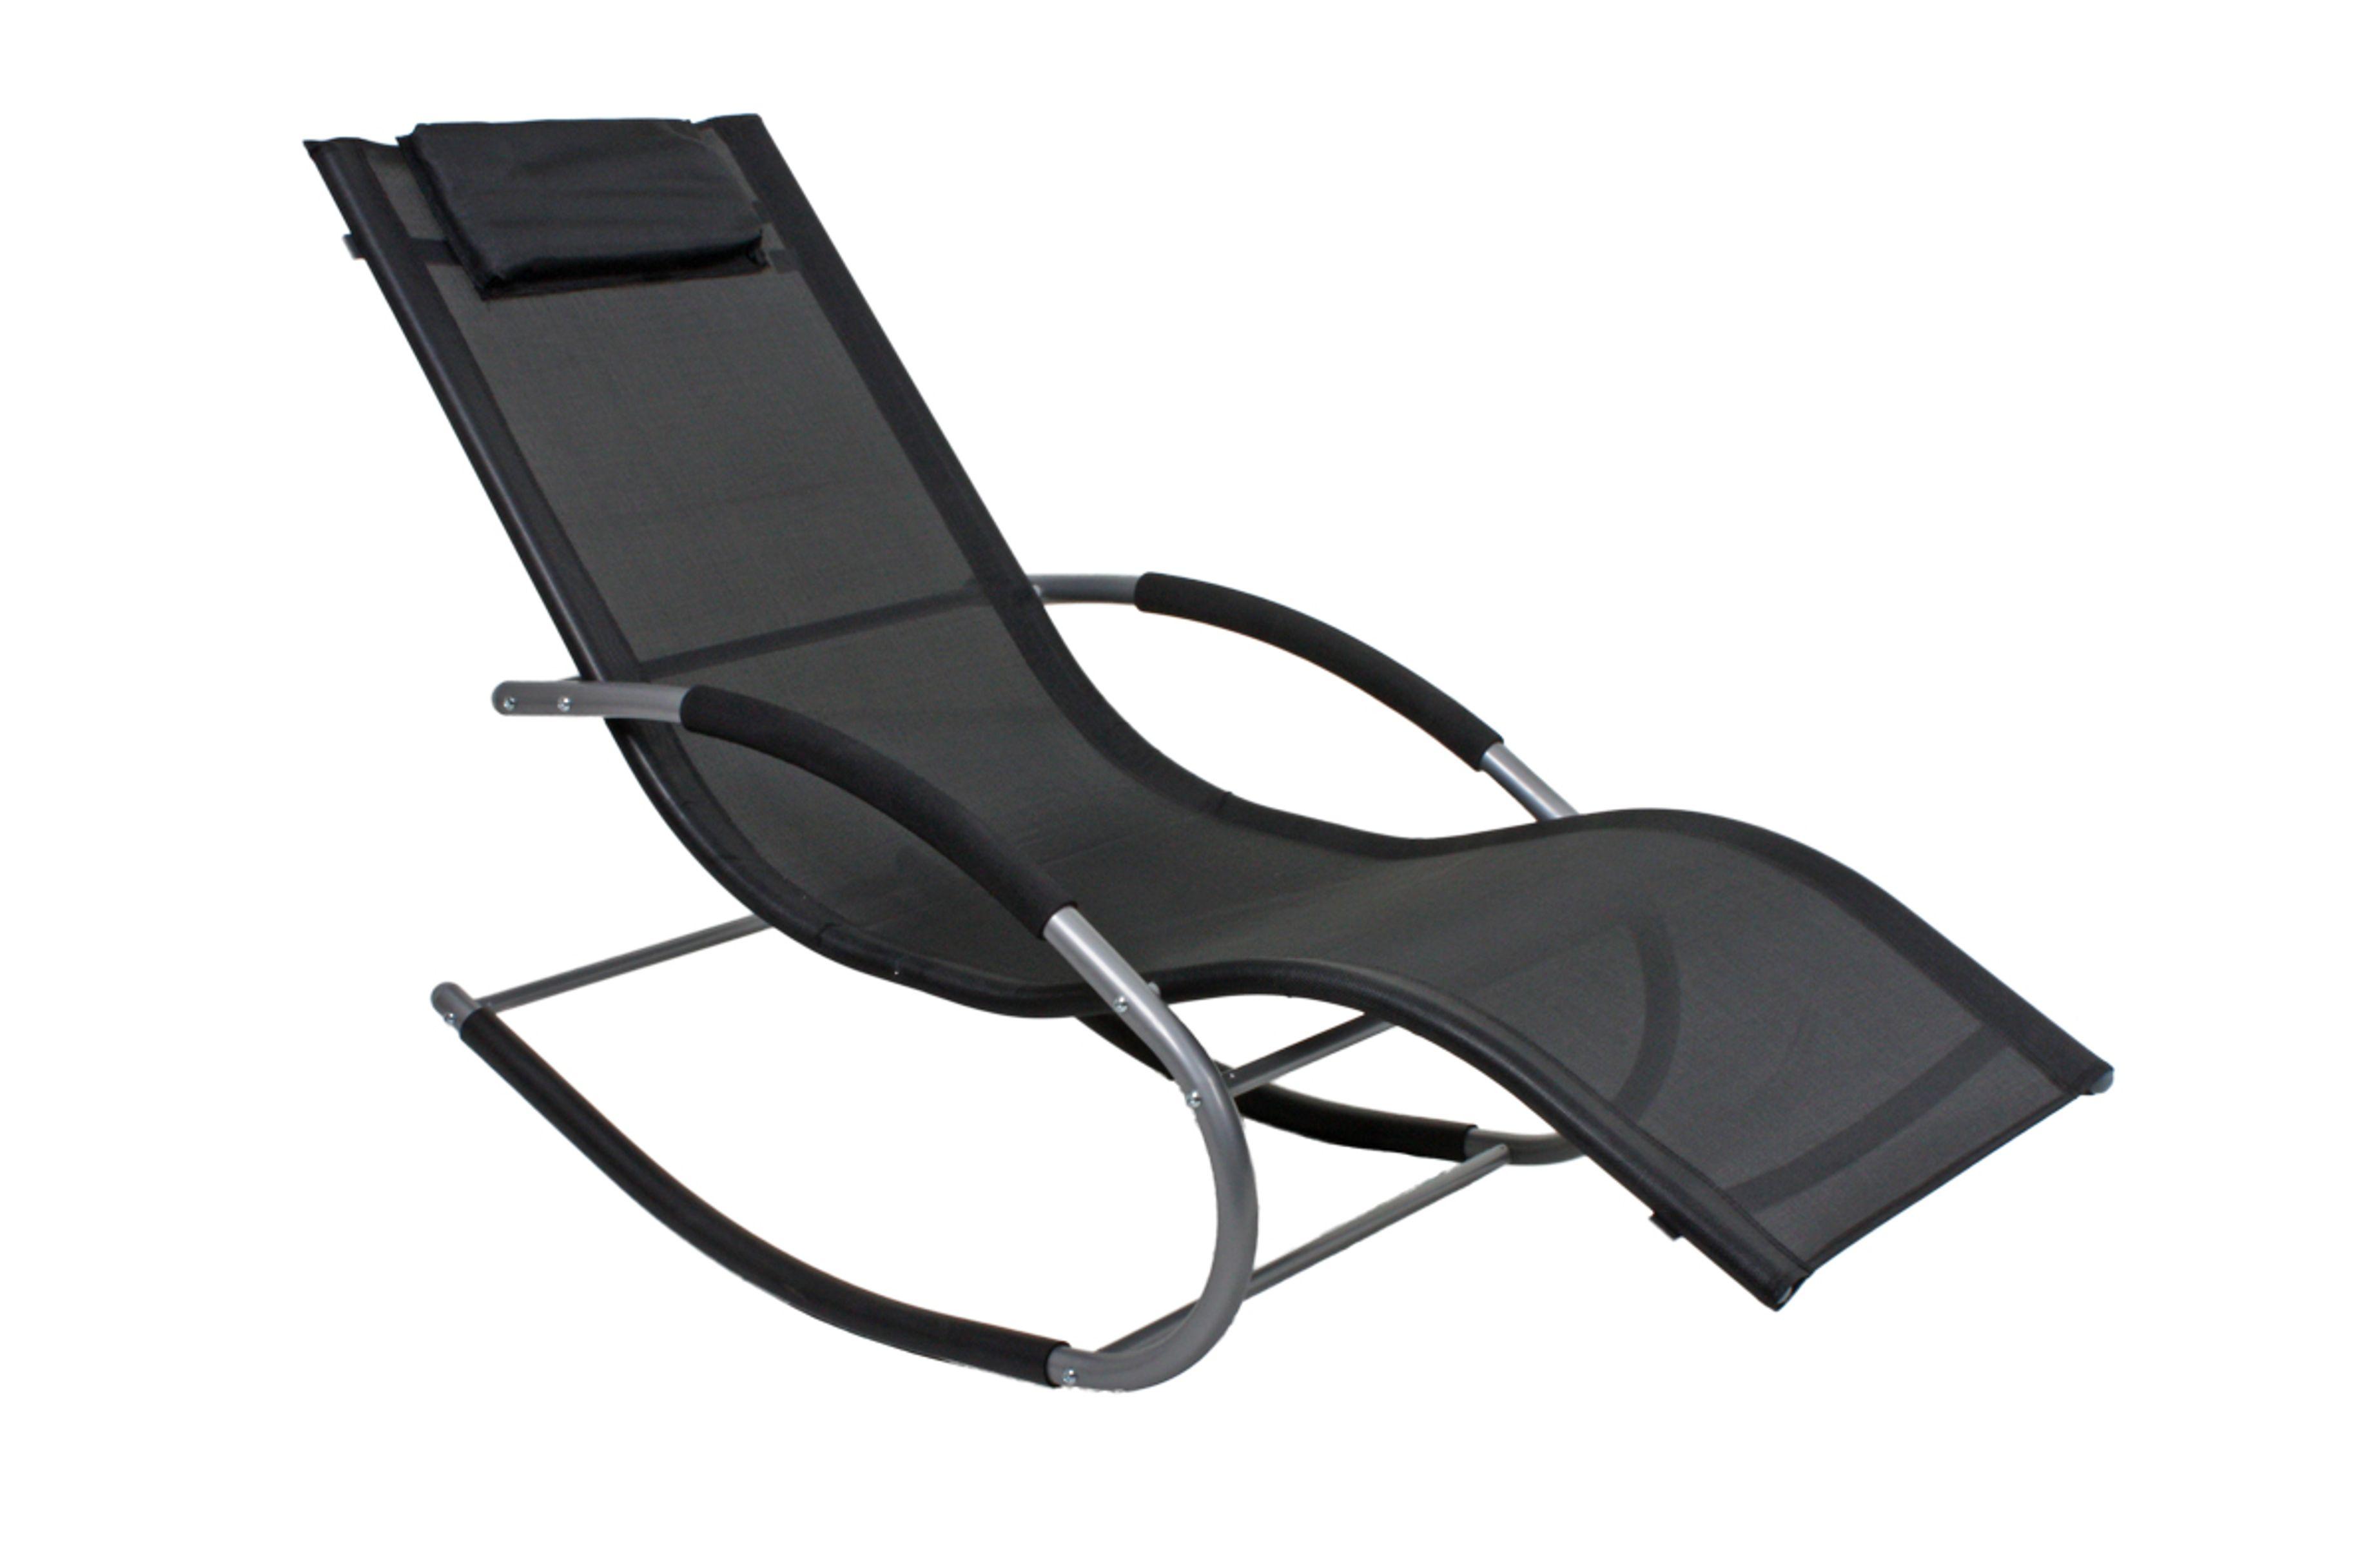 Schaukelliege schaukelstuhl gartenschaukel liege stuhl - Schaukel liegestuhl ...